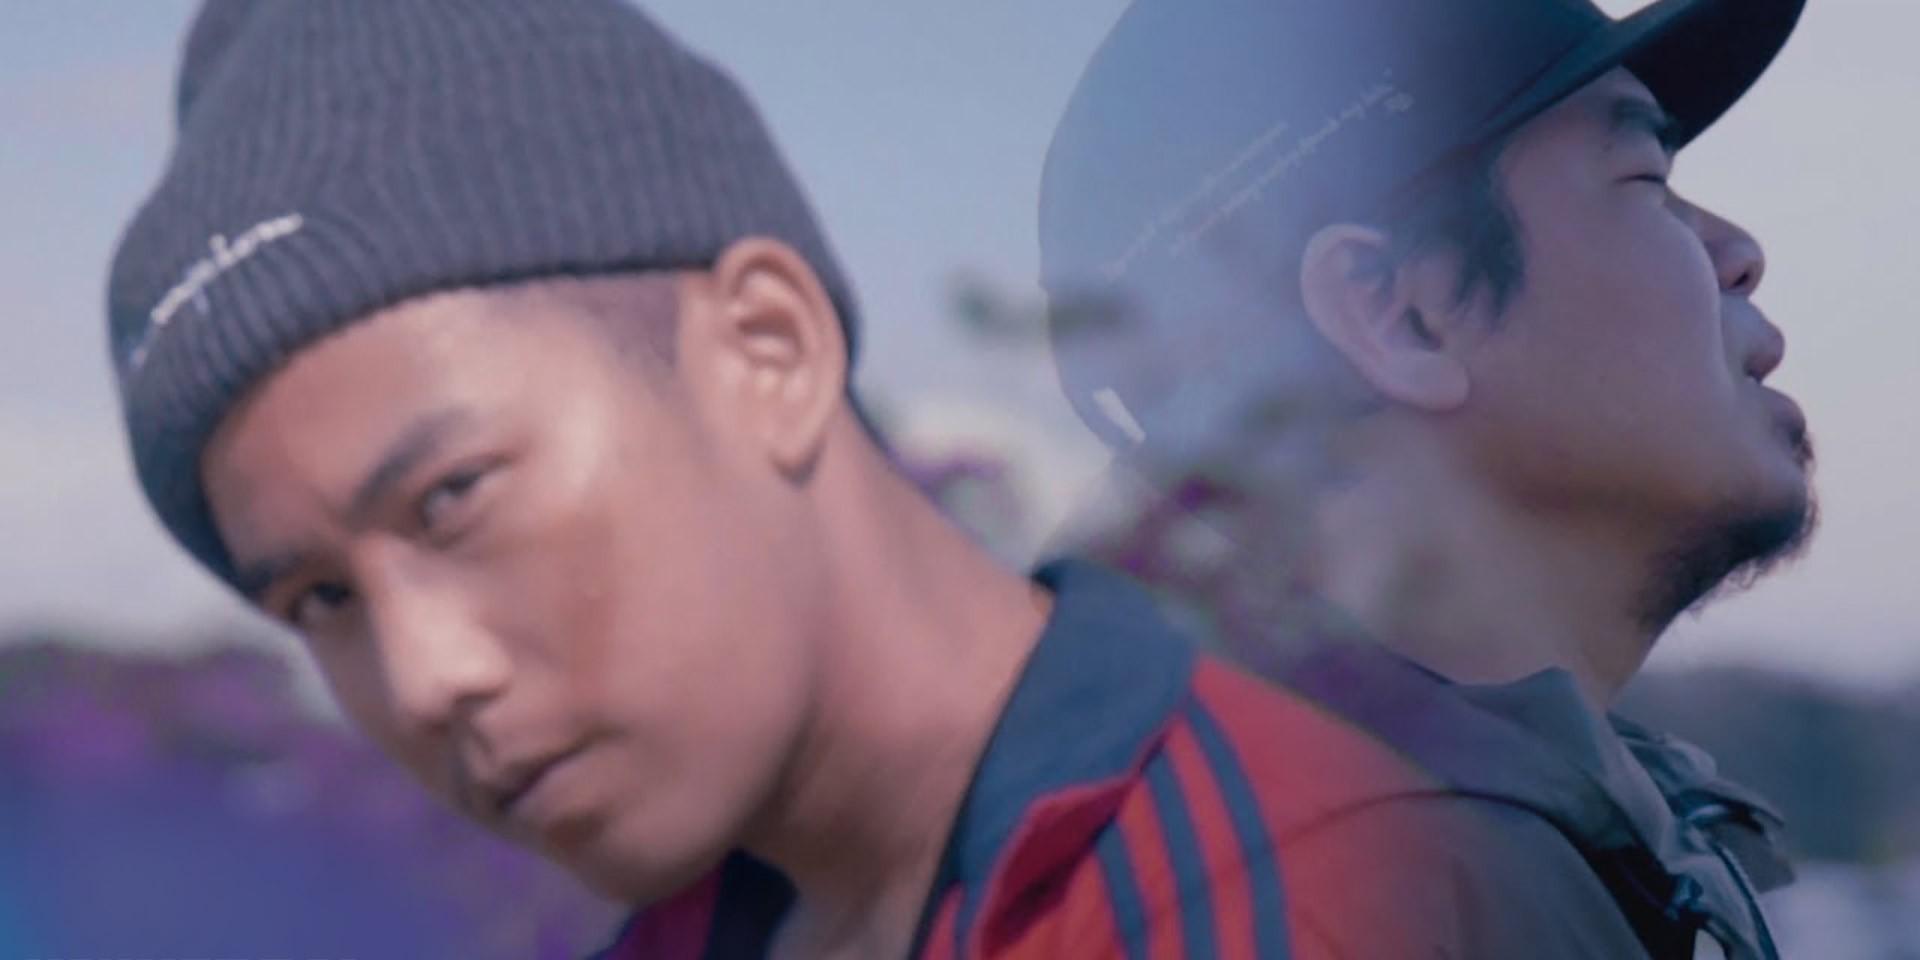 Gloc-9 & Shanti Dope to perform at upcoming Bone Thugs-N-Harmony concert